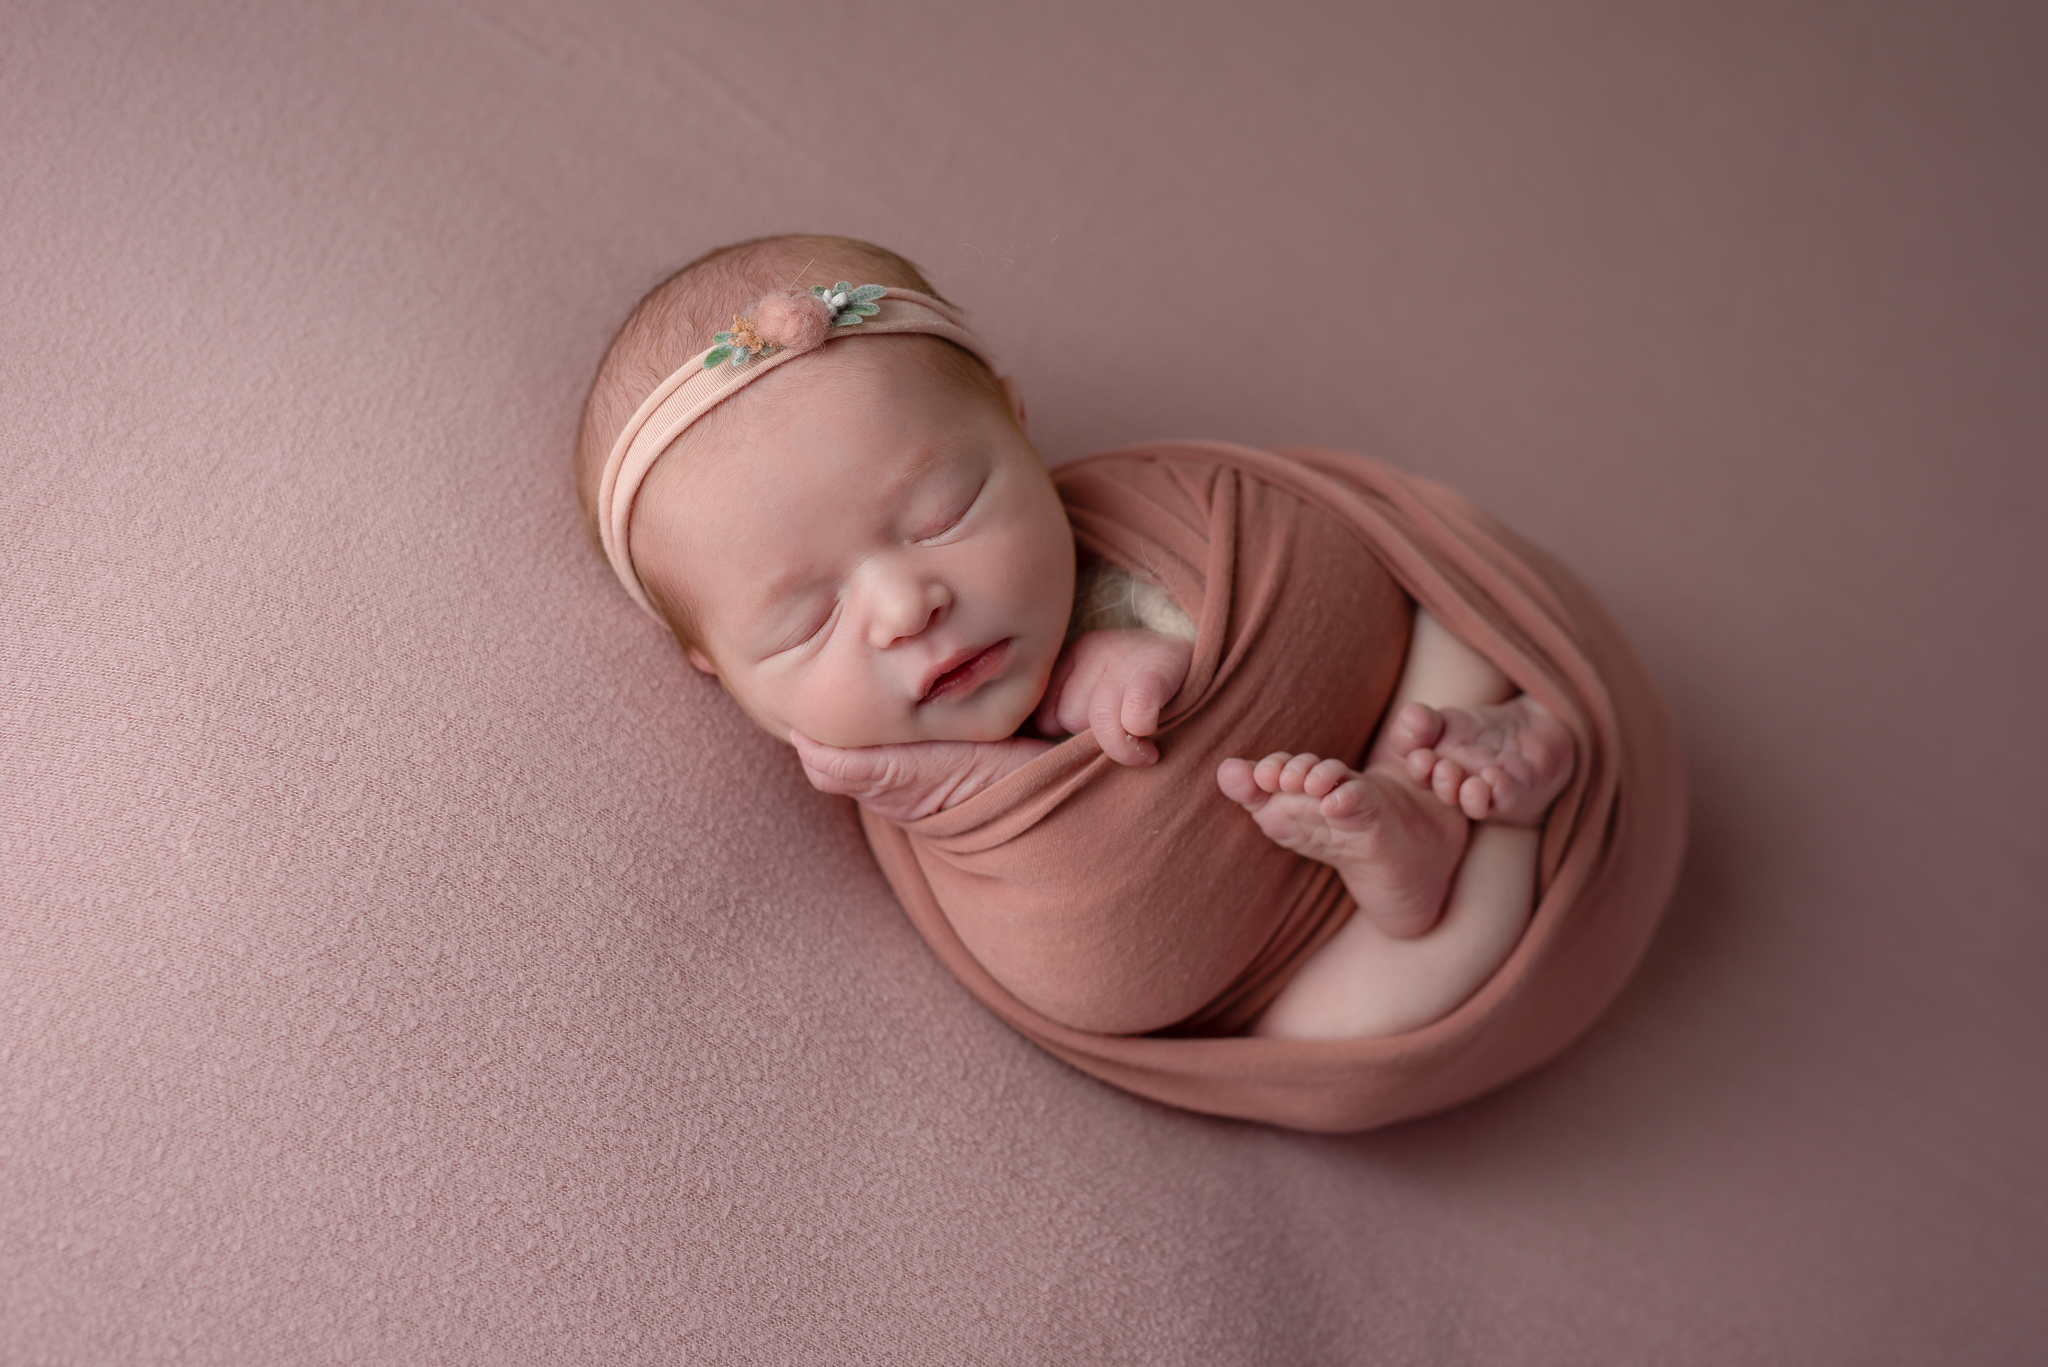 Newborn488NaomiLuciennePhotography032019-Edit.jpg